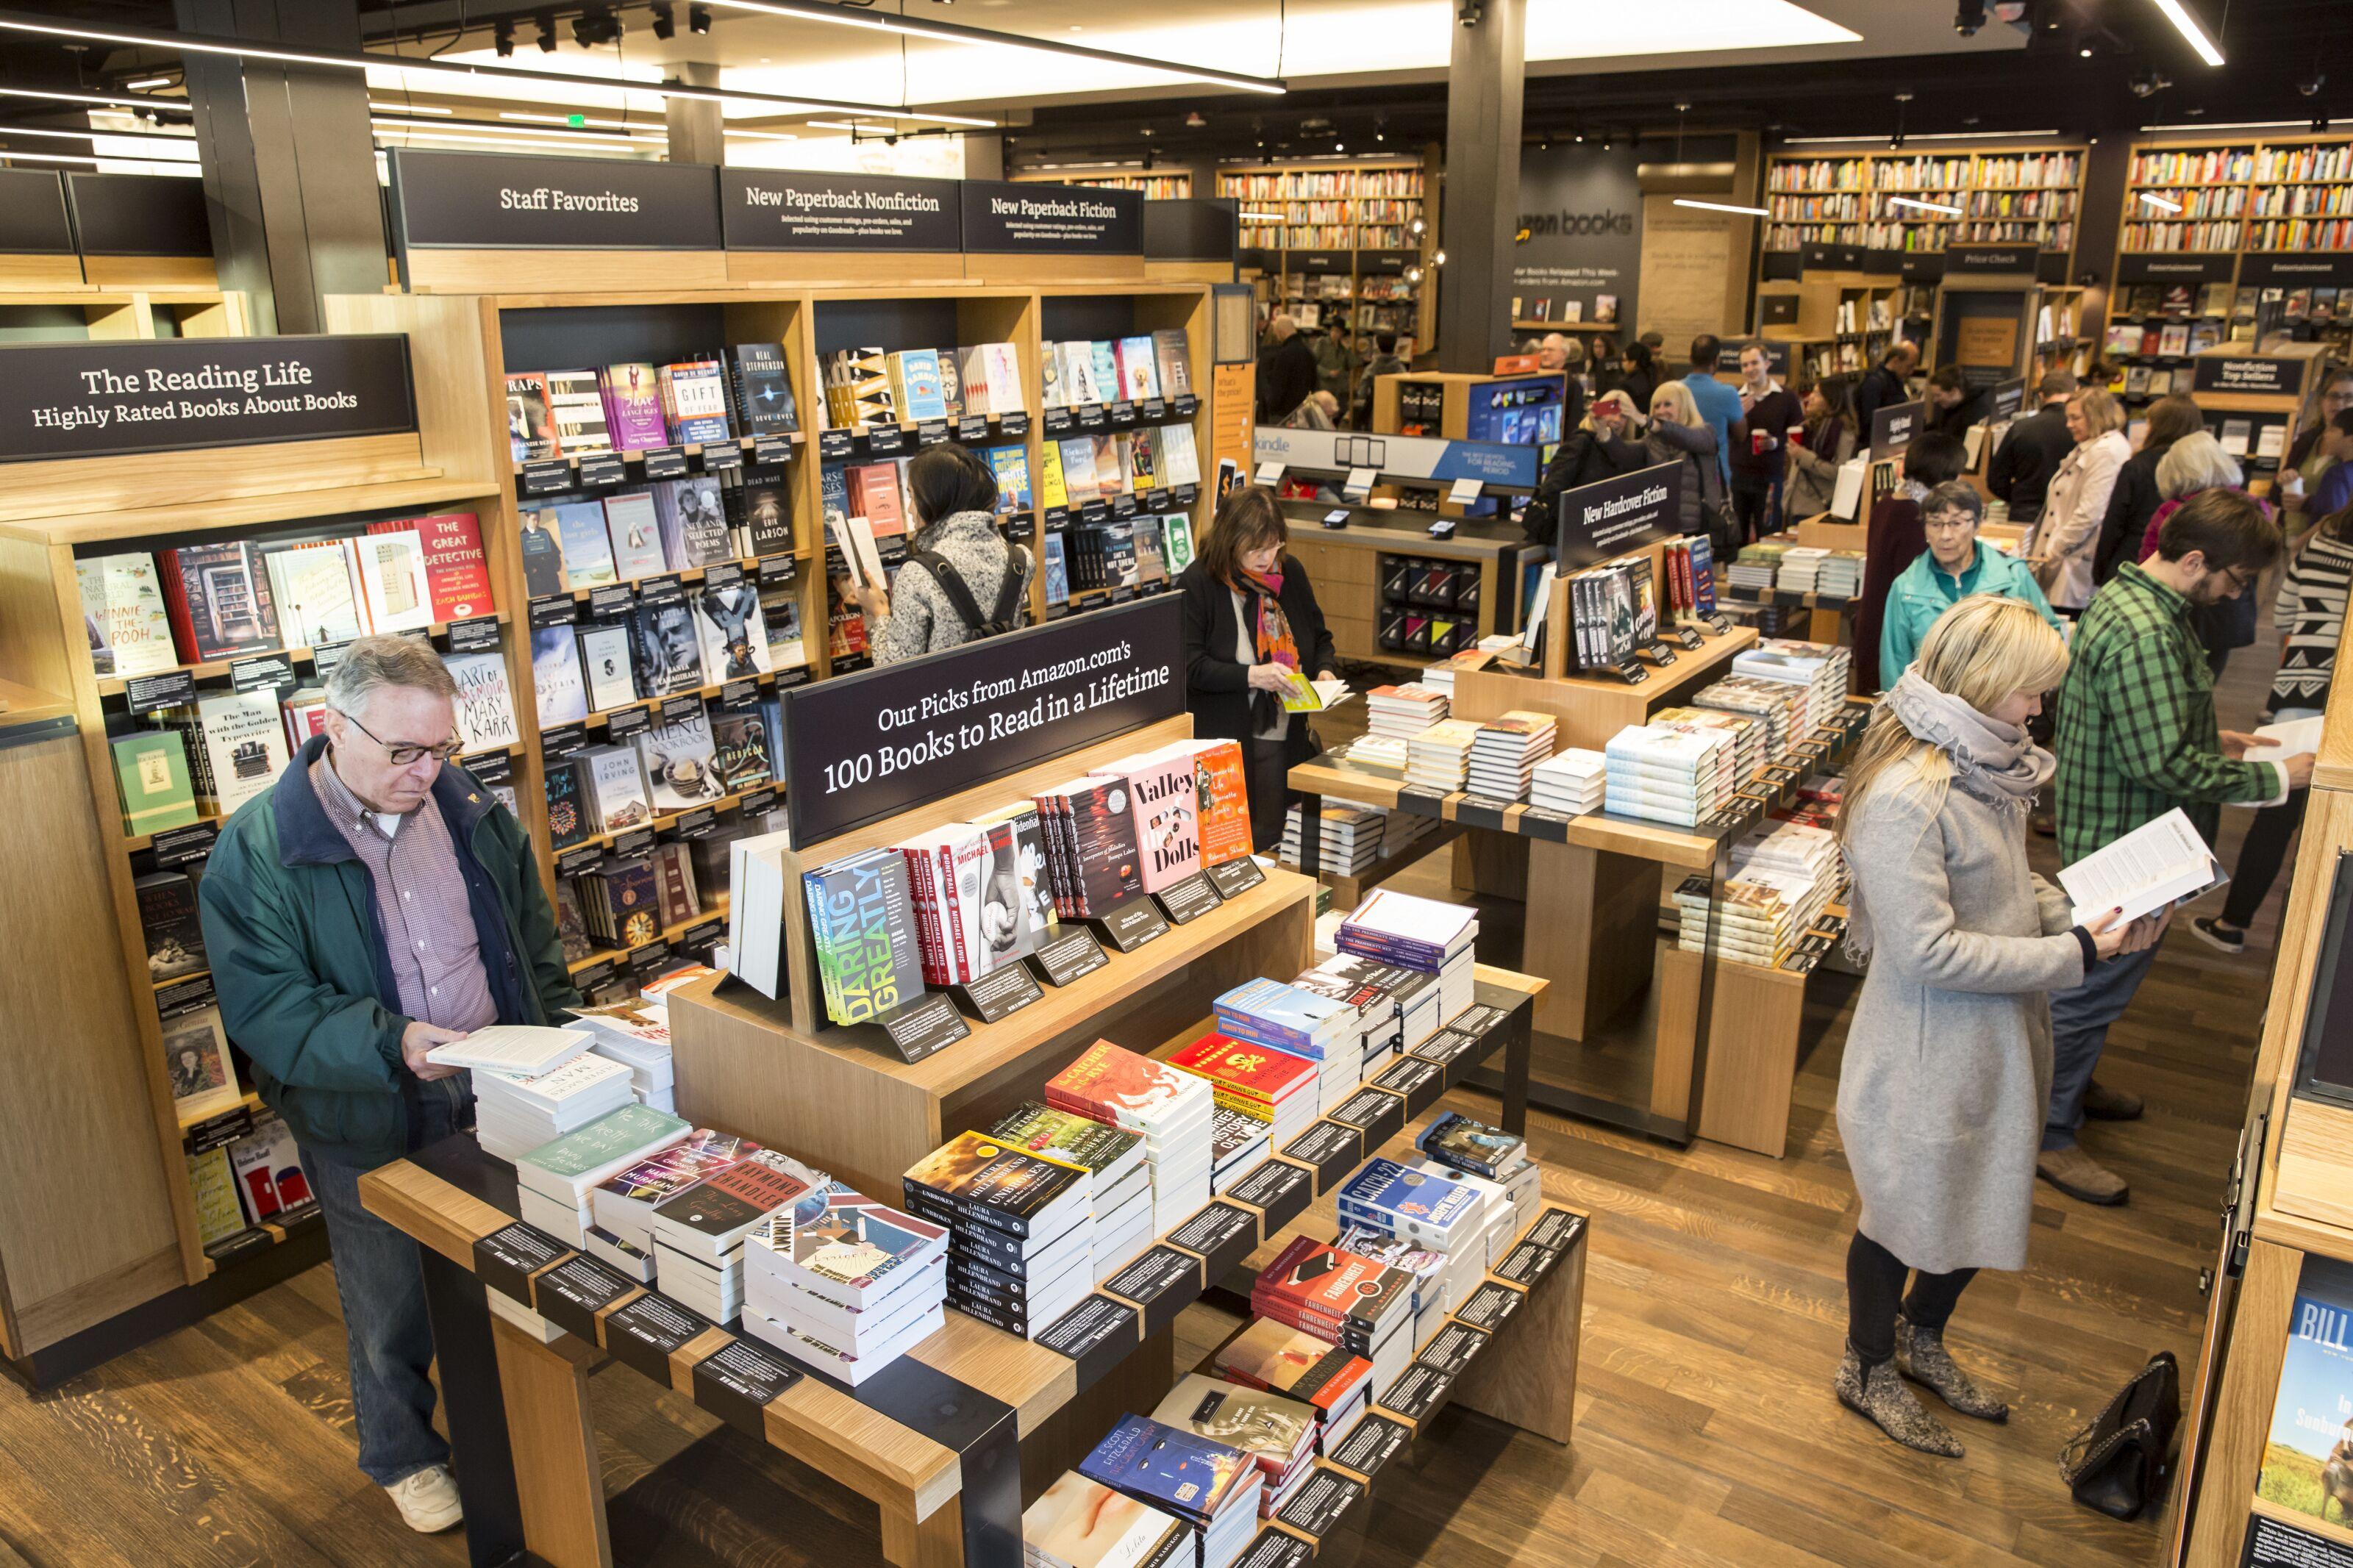 Amazon books: Most sold books on Amazon last week [Aug. 11-17]